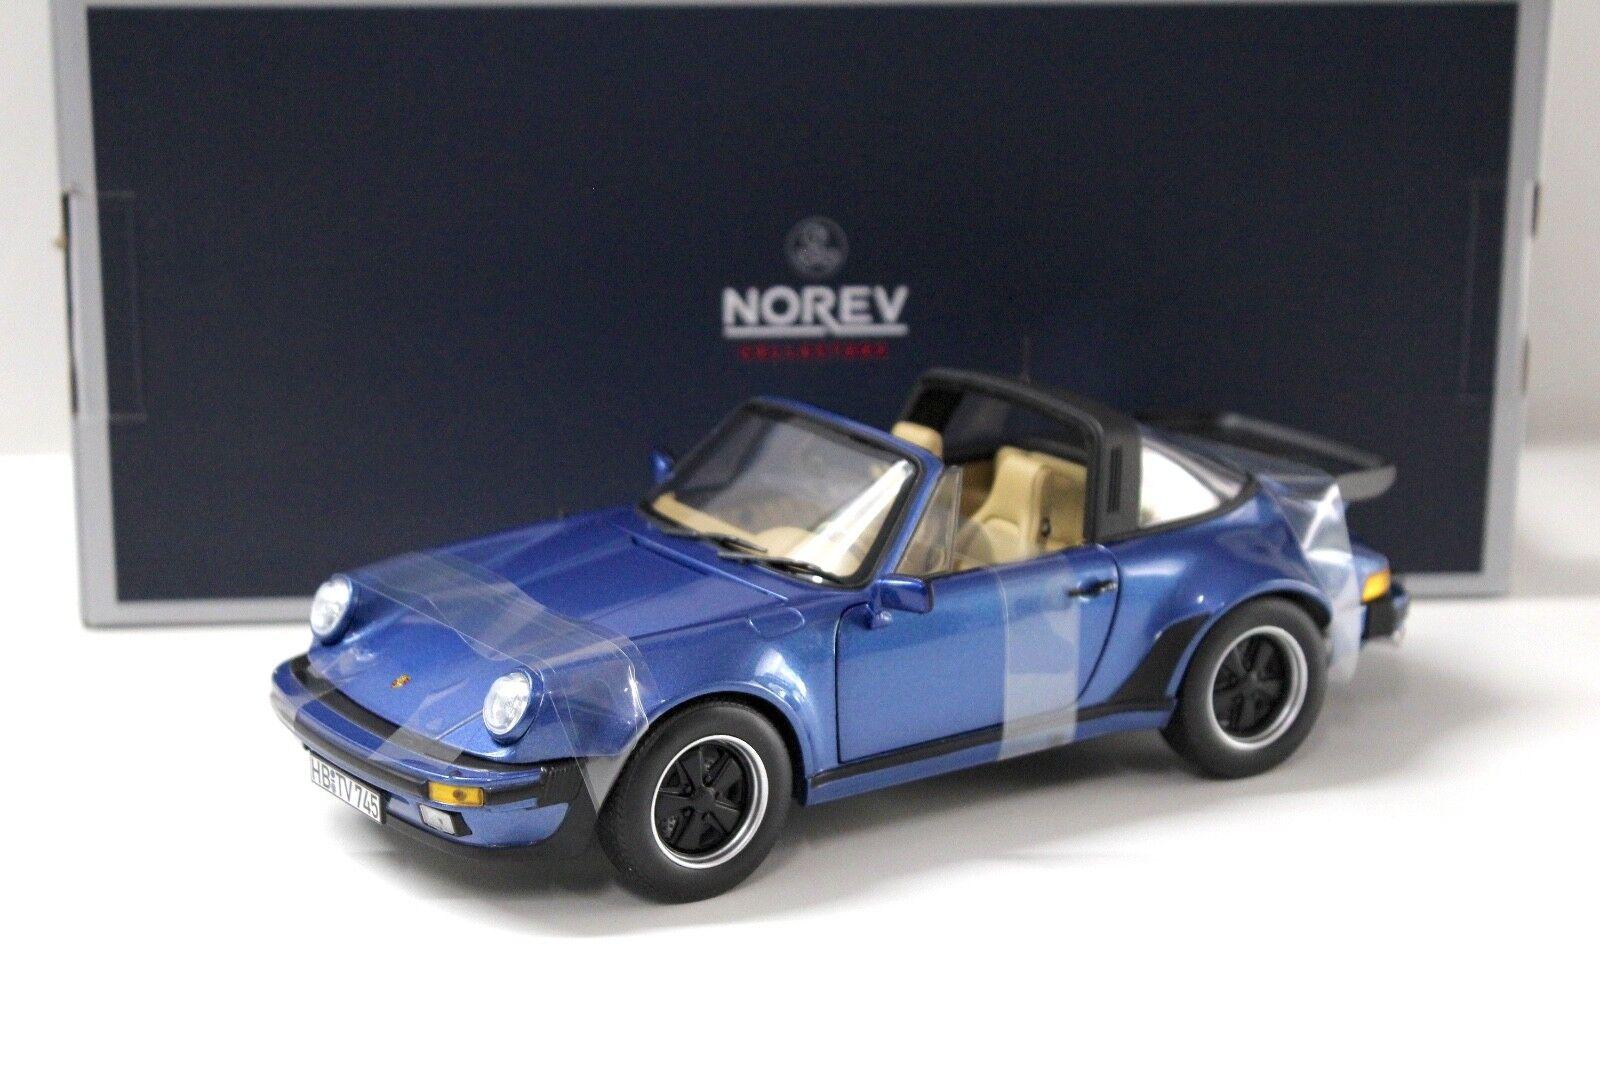 1 18 NOREV PORSCHE 911 Turbo Targa 3.3 azul 1987 NEW per PREMIUM-MODELCARS